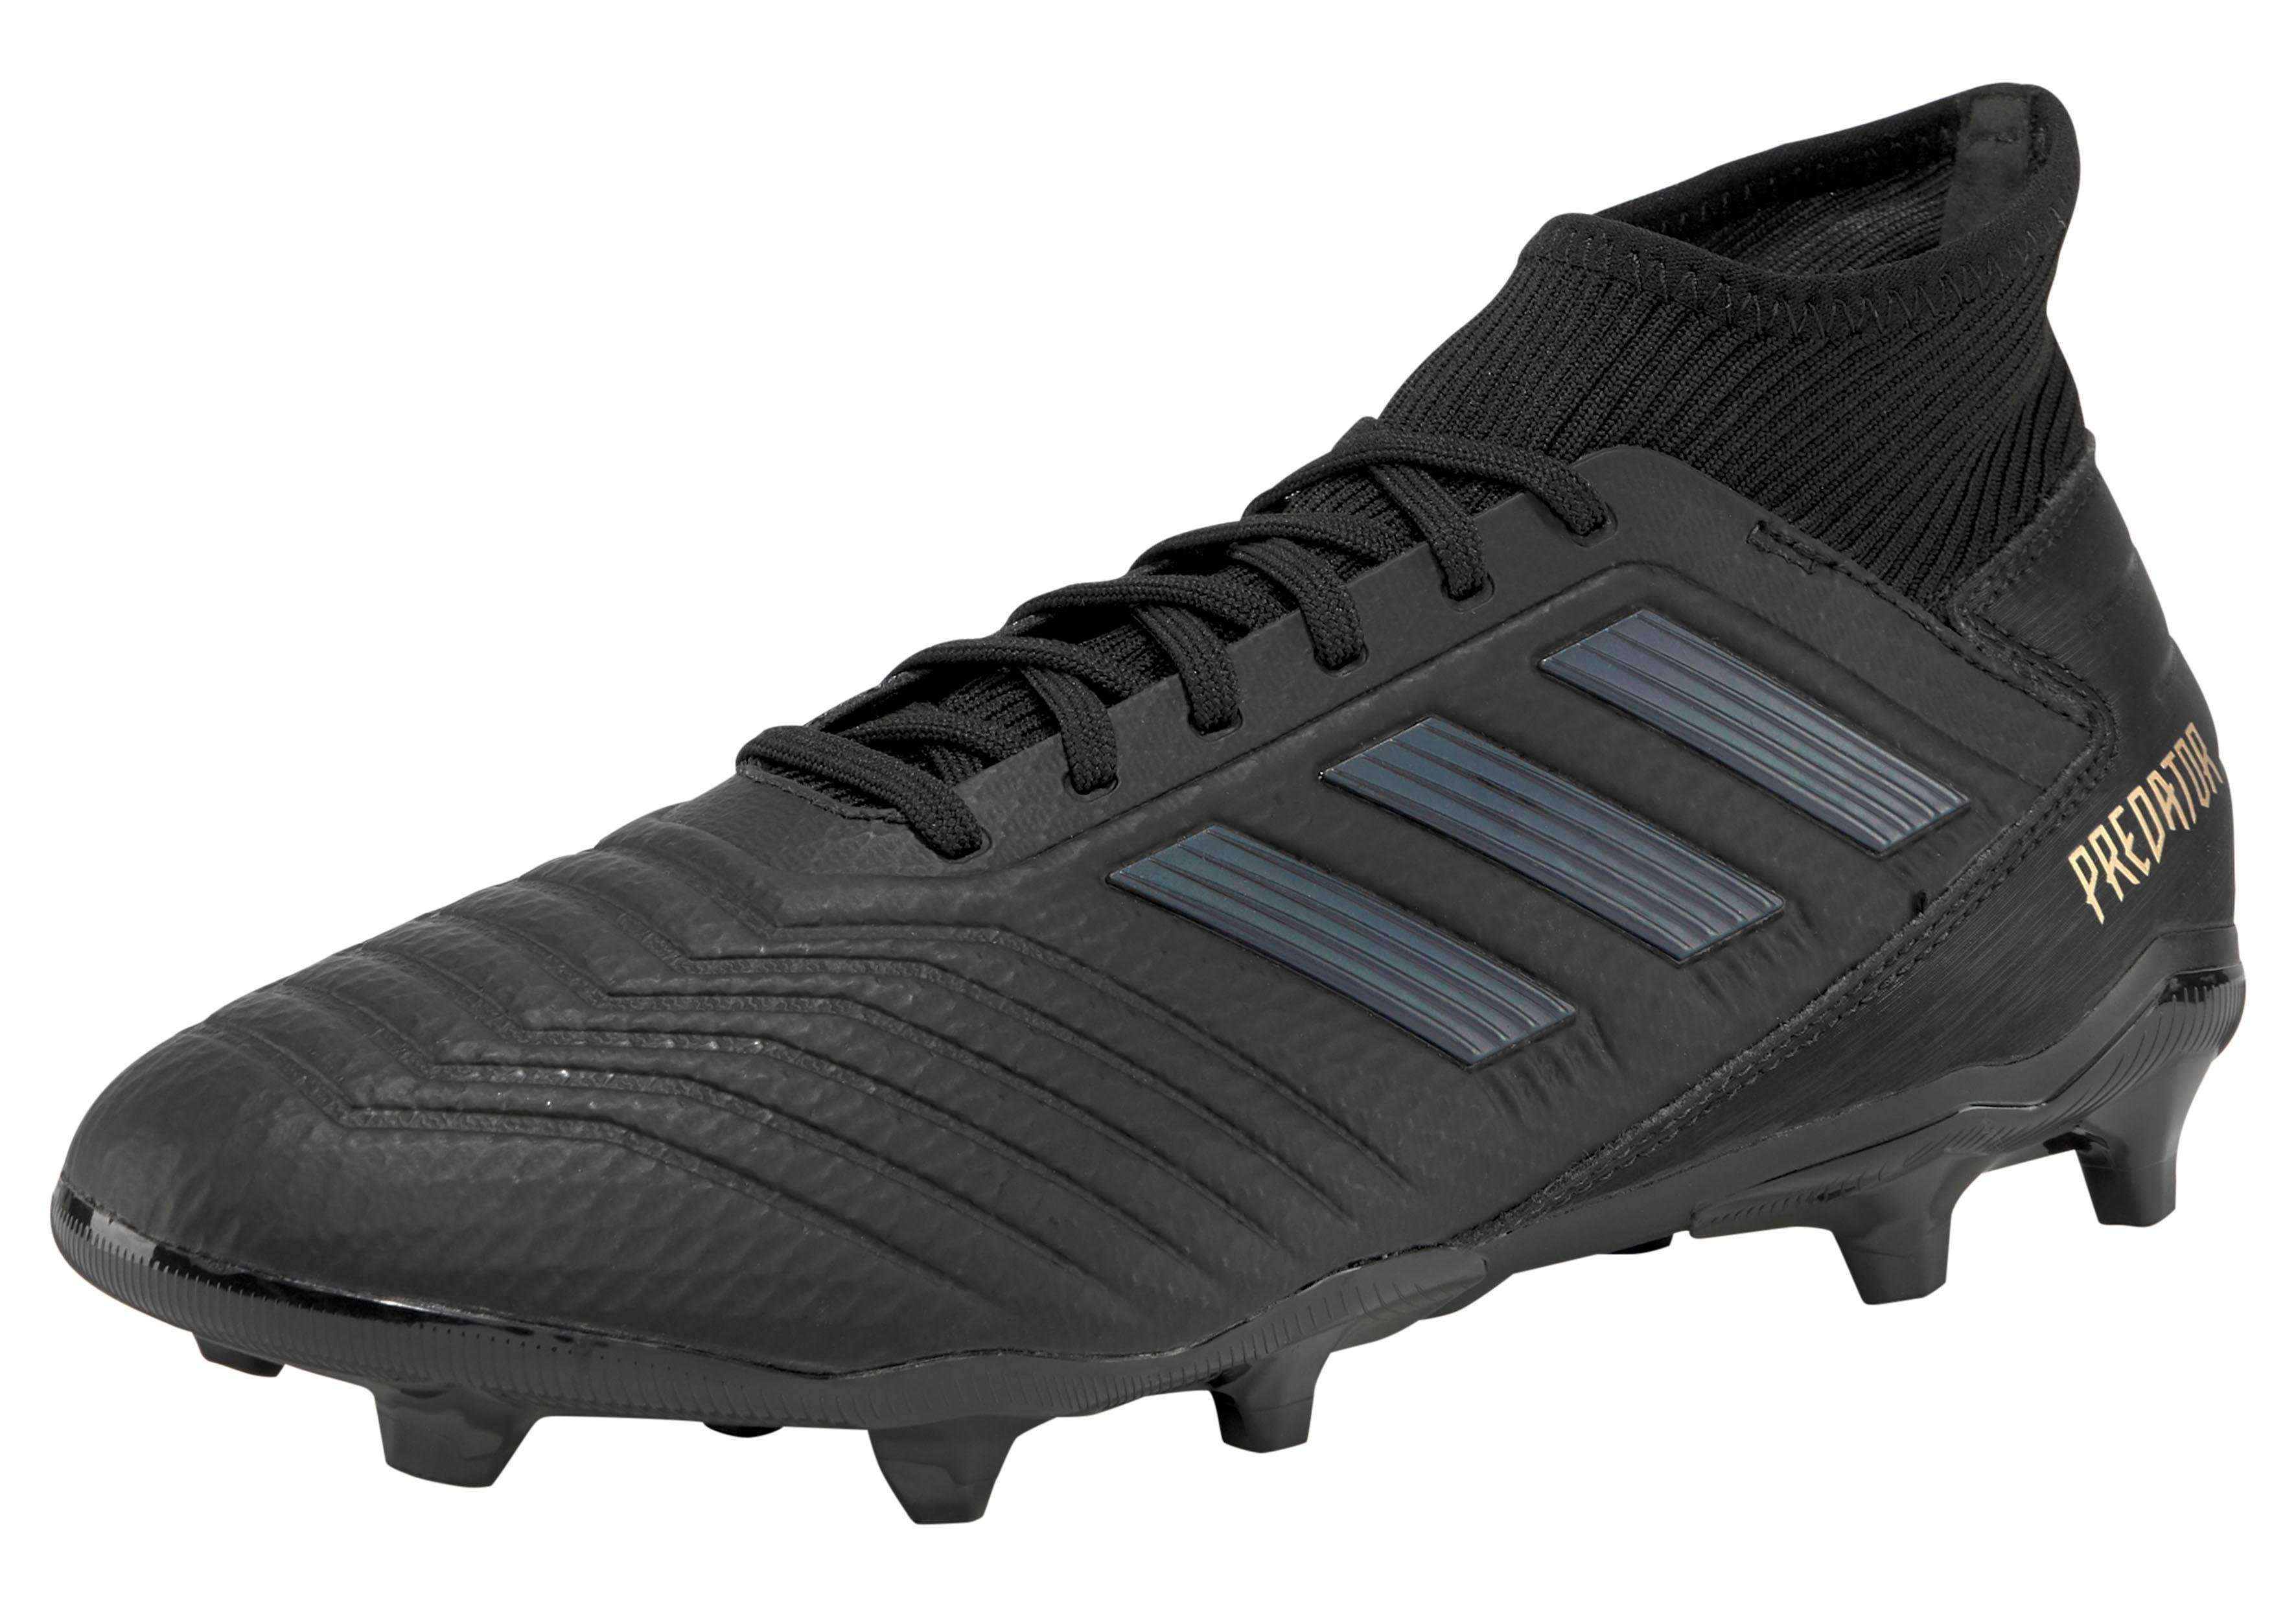 adidas Performance voetbalschoenen »PREDATOR 19.3 FG« nu online kopen bij OTTO